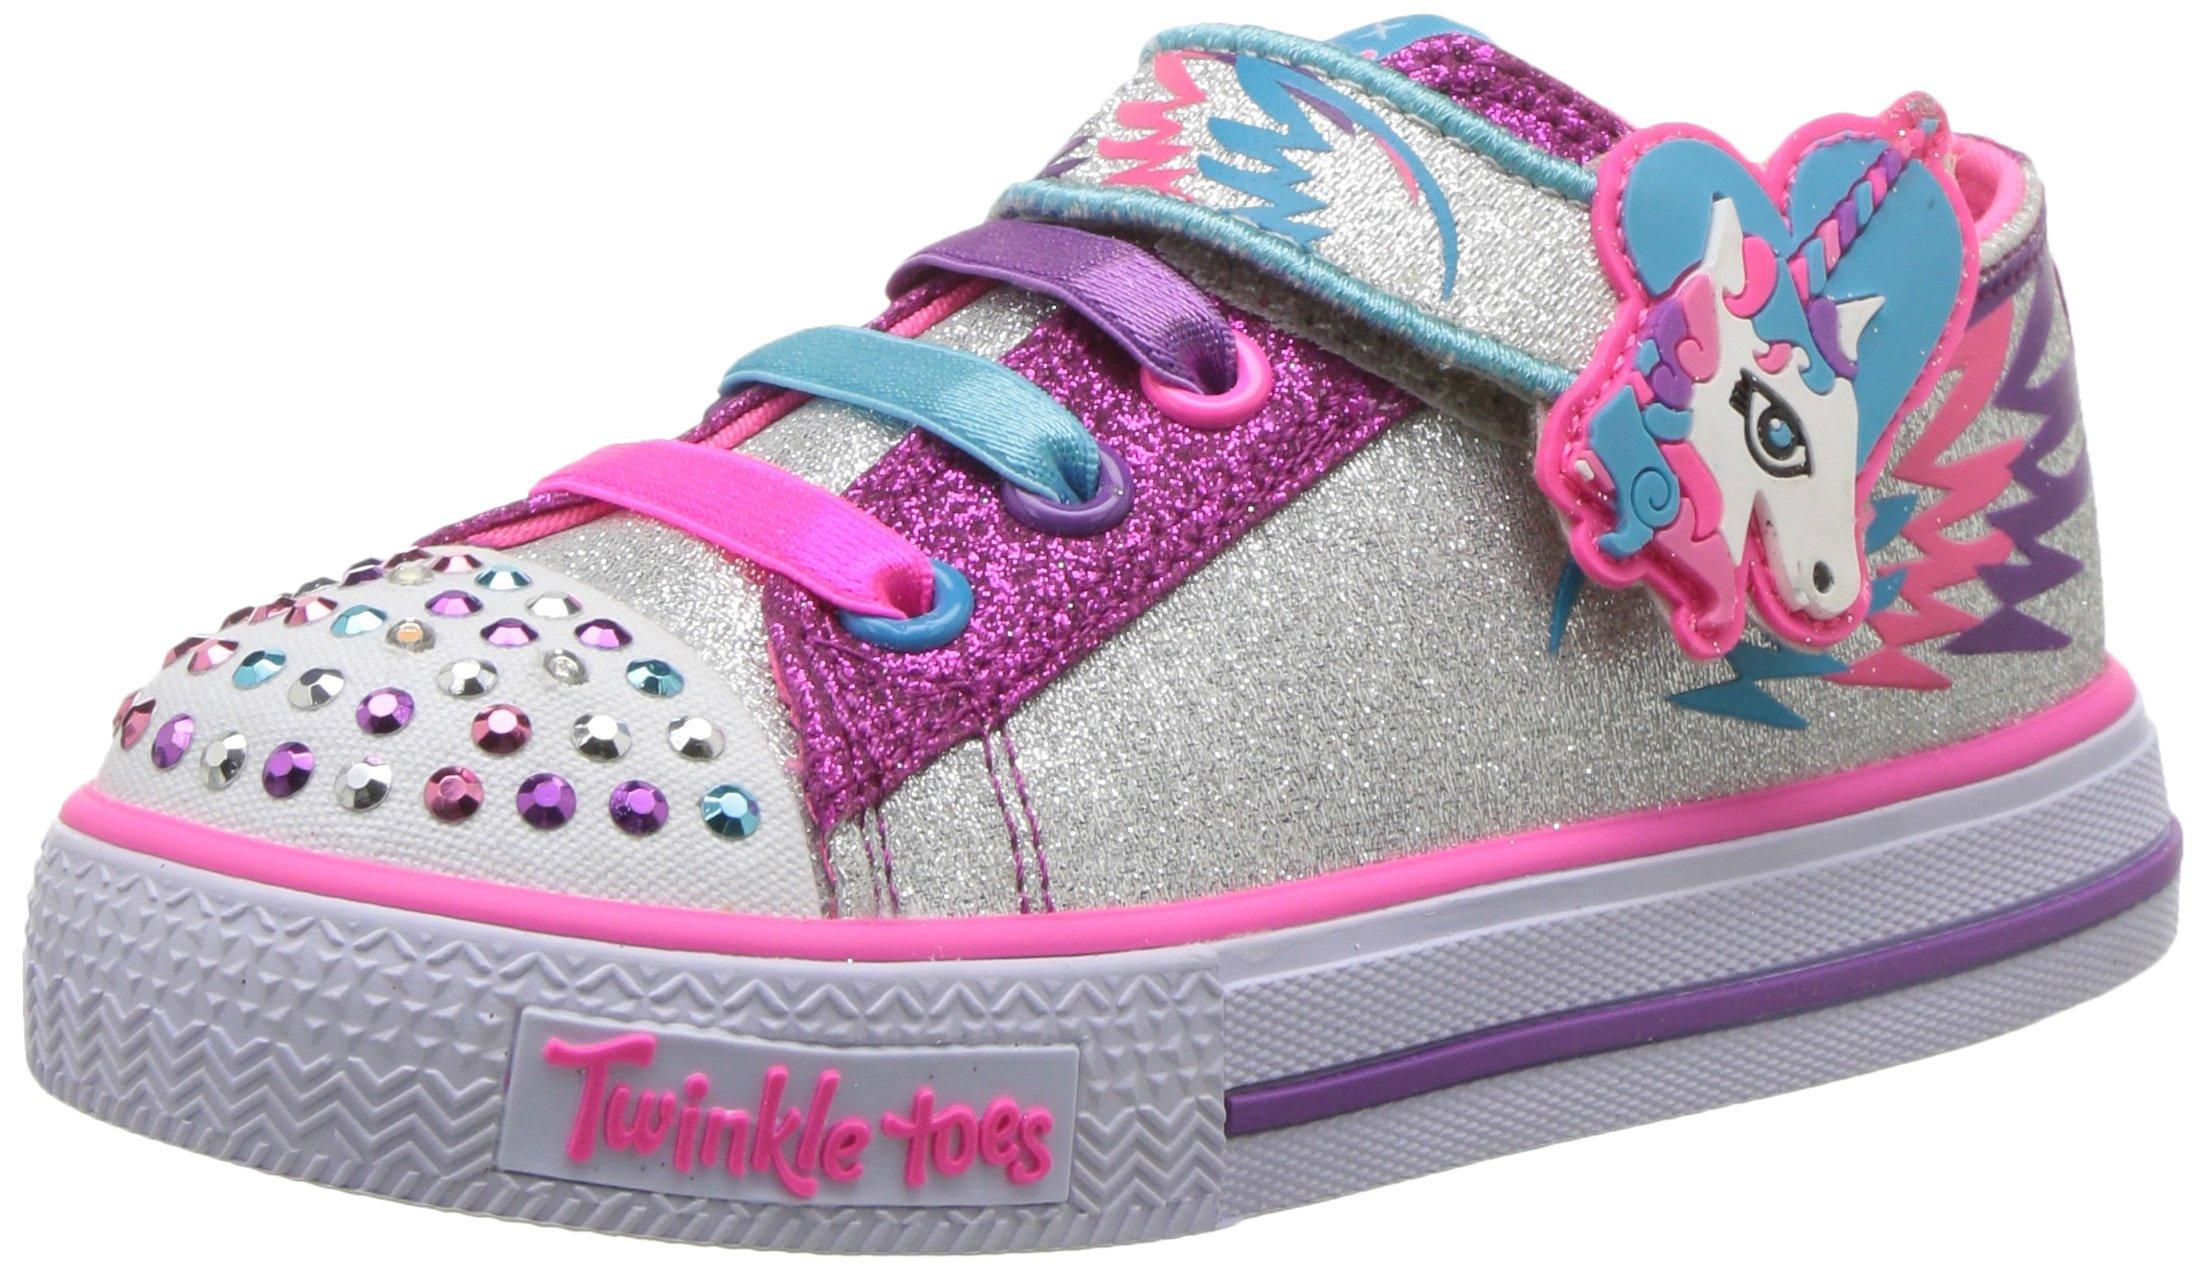 Skechers Girls Twinkle Toes Party Pets